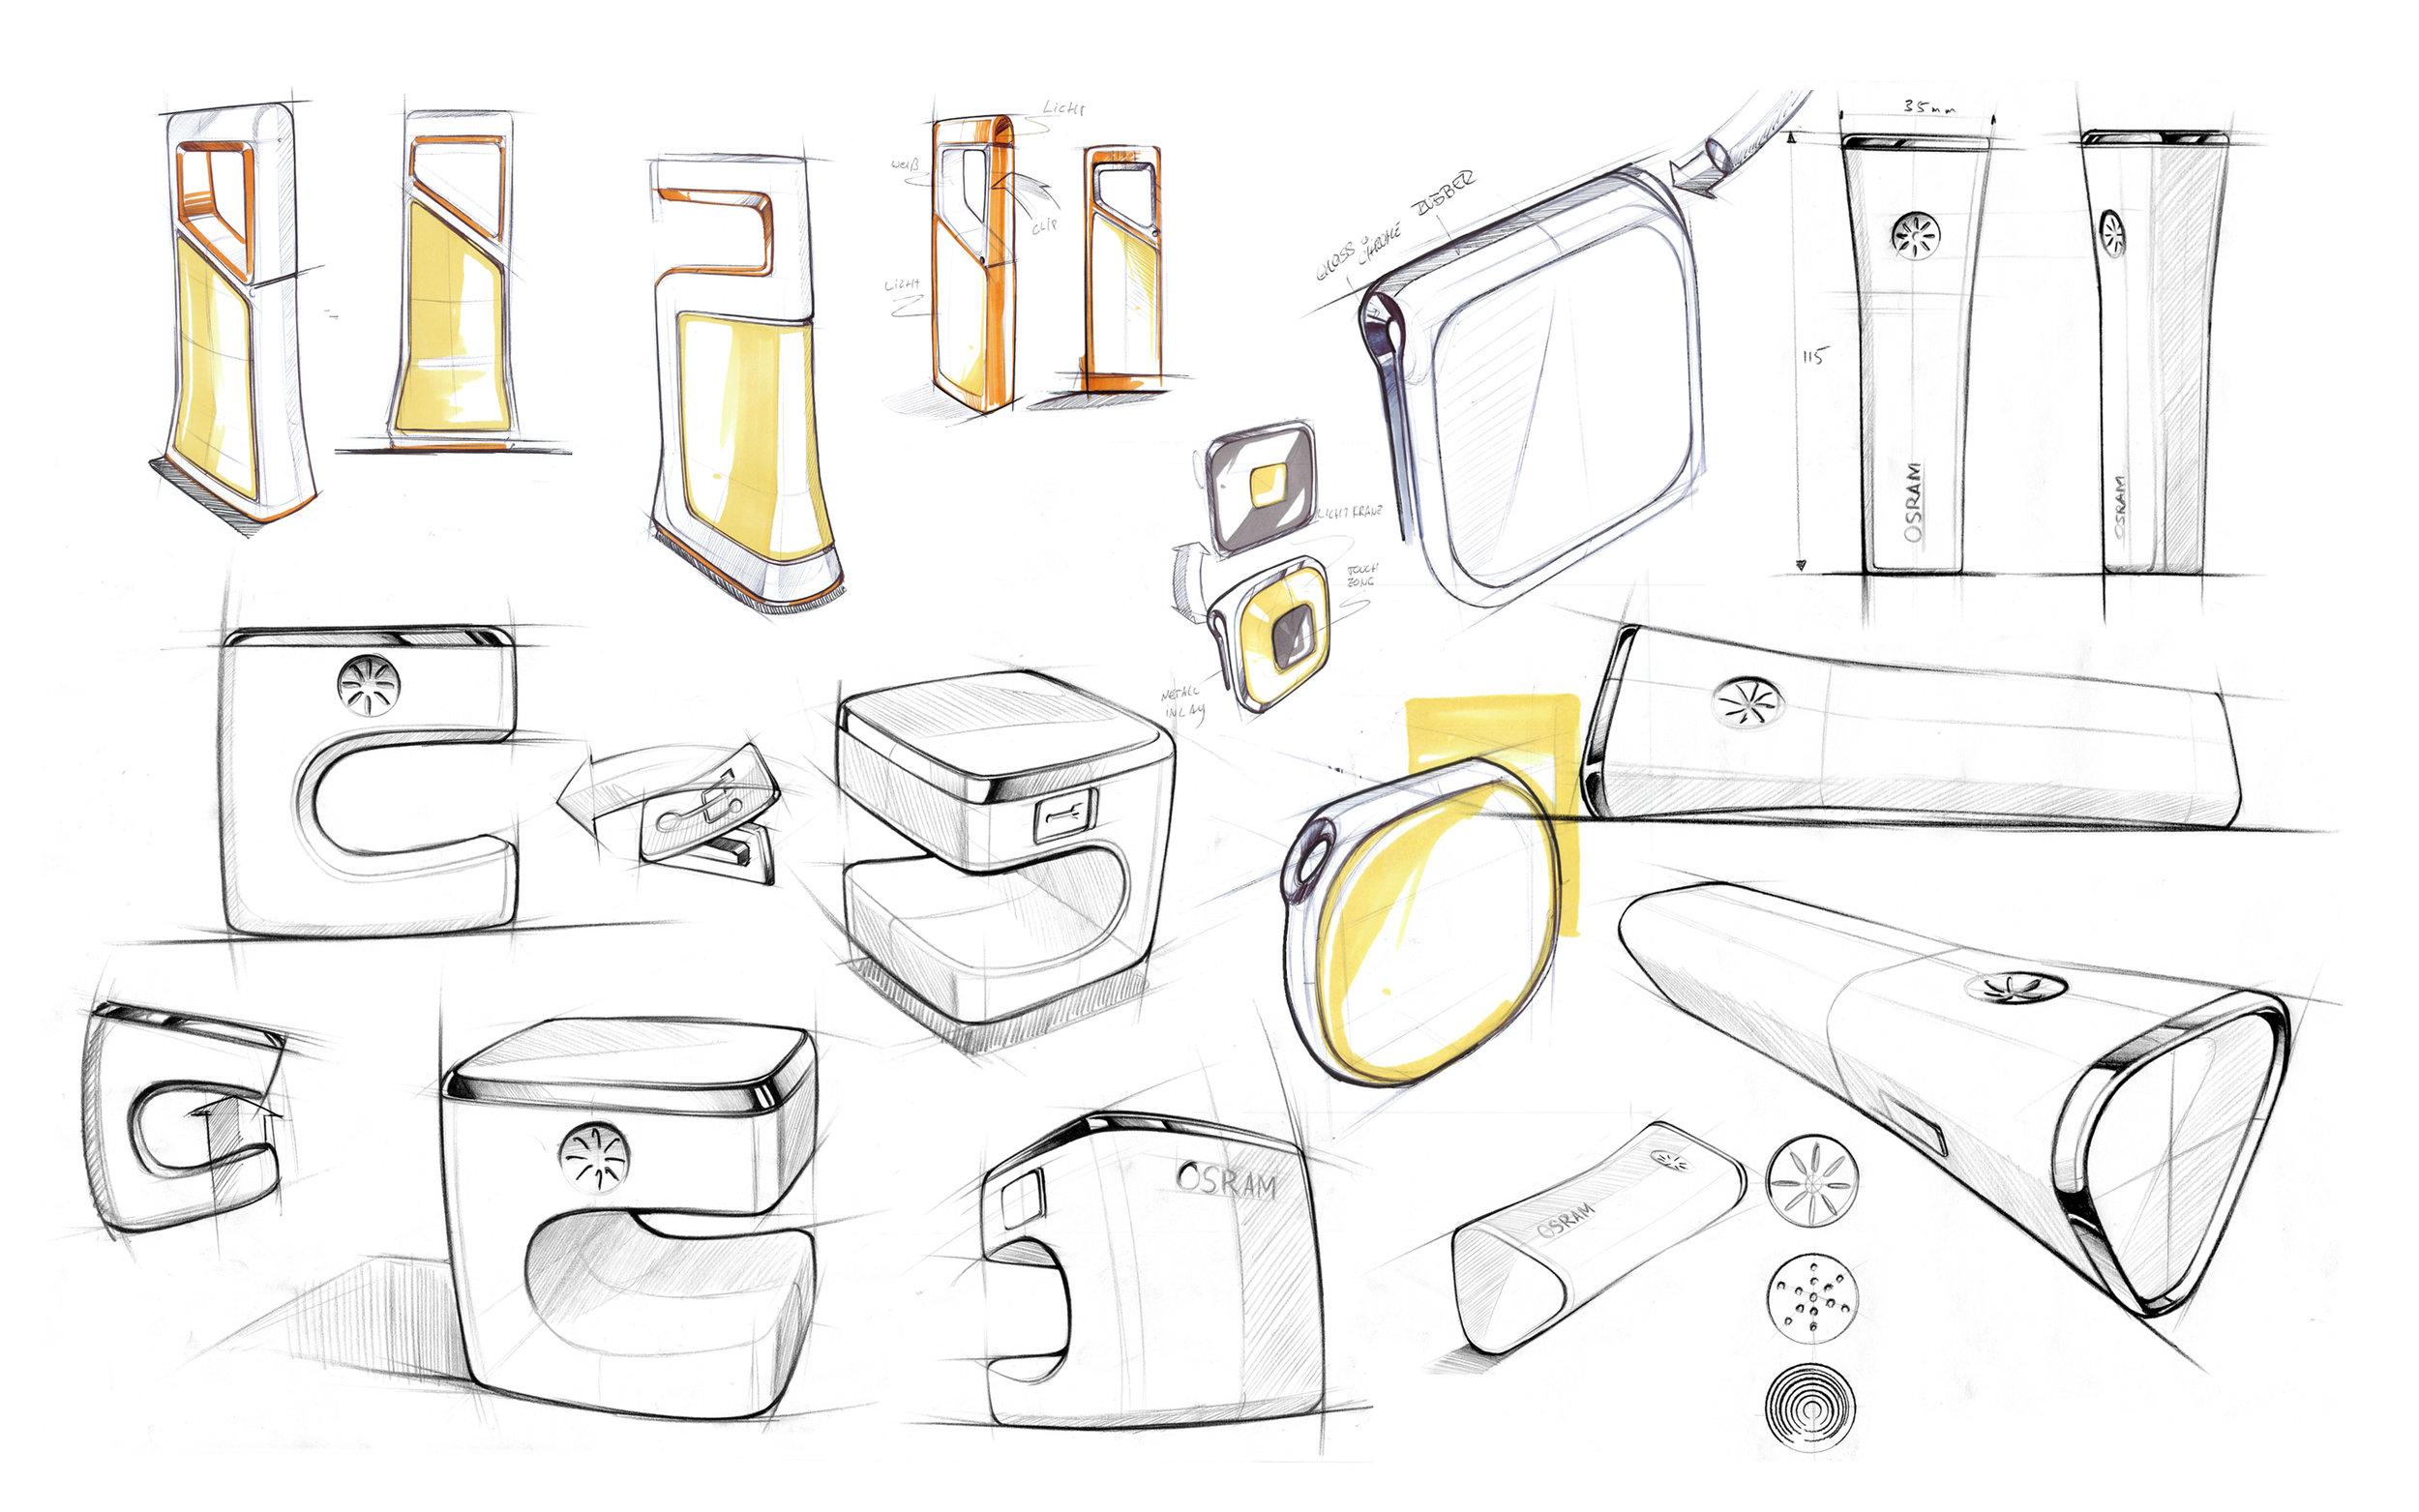 osram_sketches.jpg